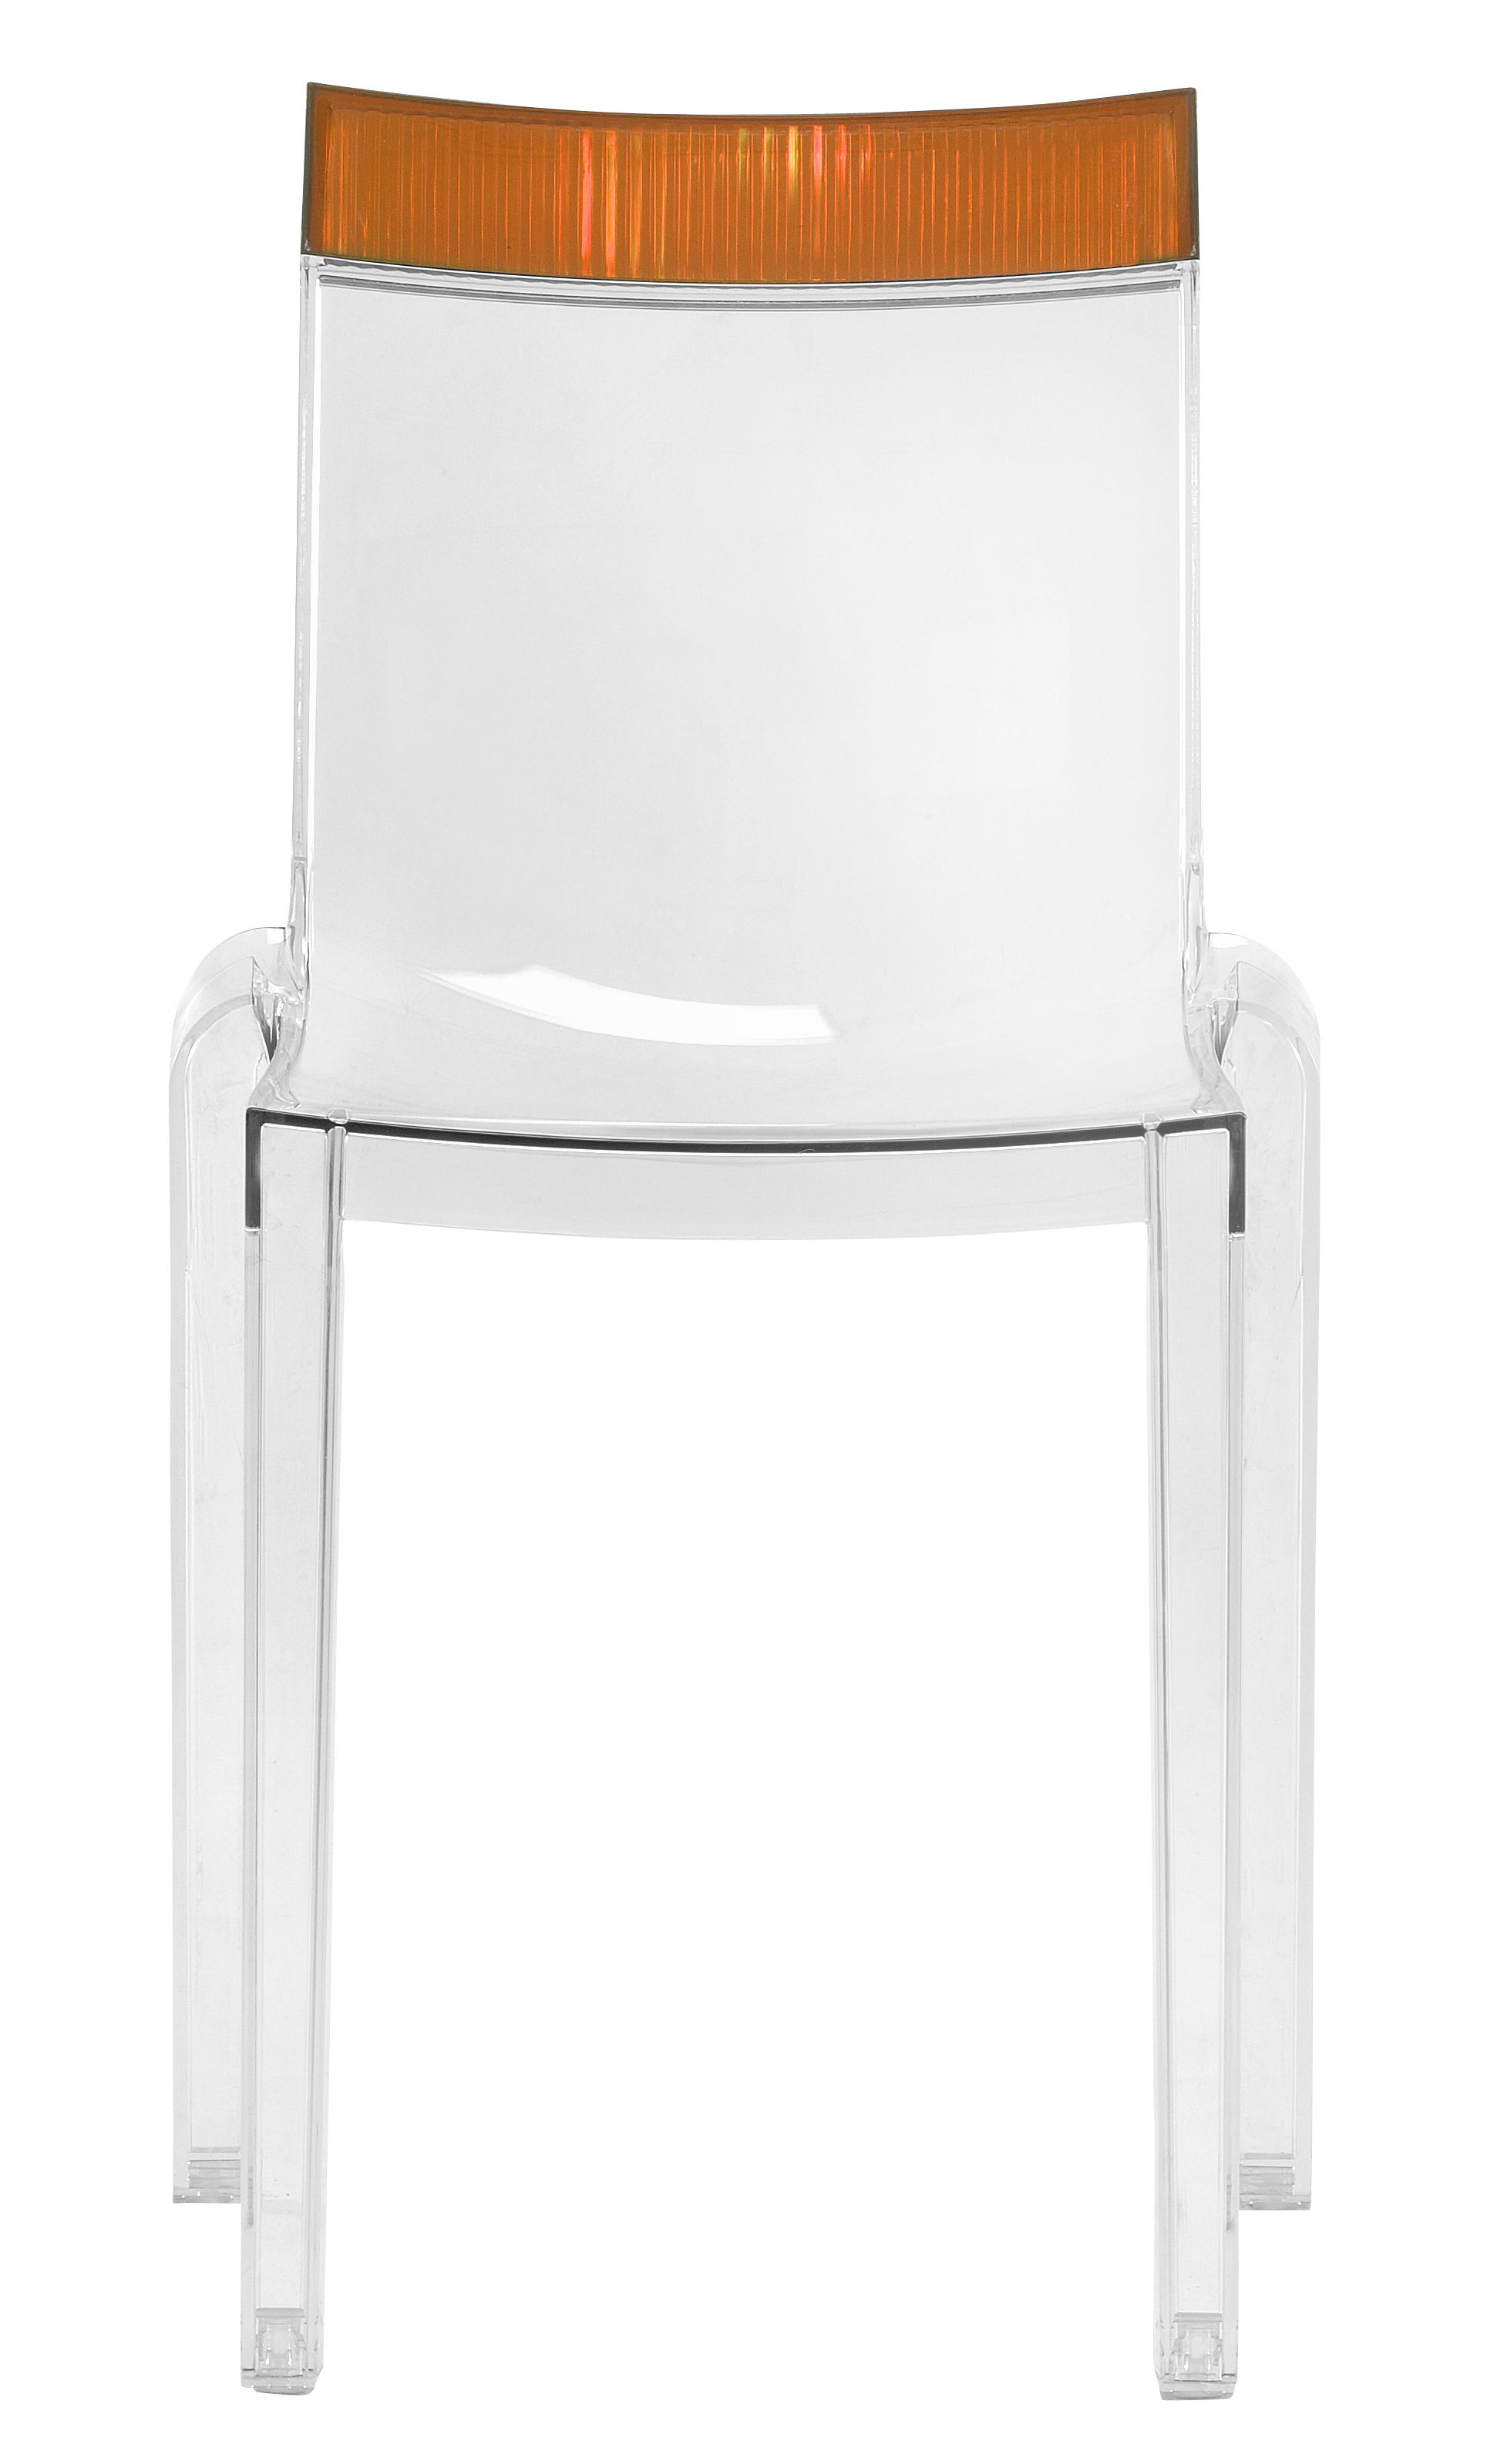 chaise empilable hi cut transparente polycarbonate cristal orange kartell. Black Bedroom Furniture Sets. Home Design Ideas